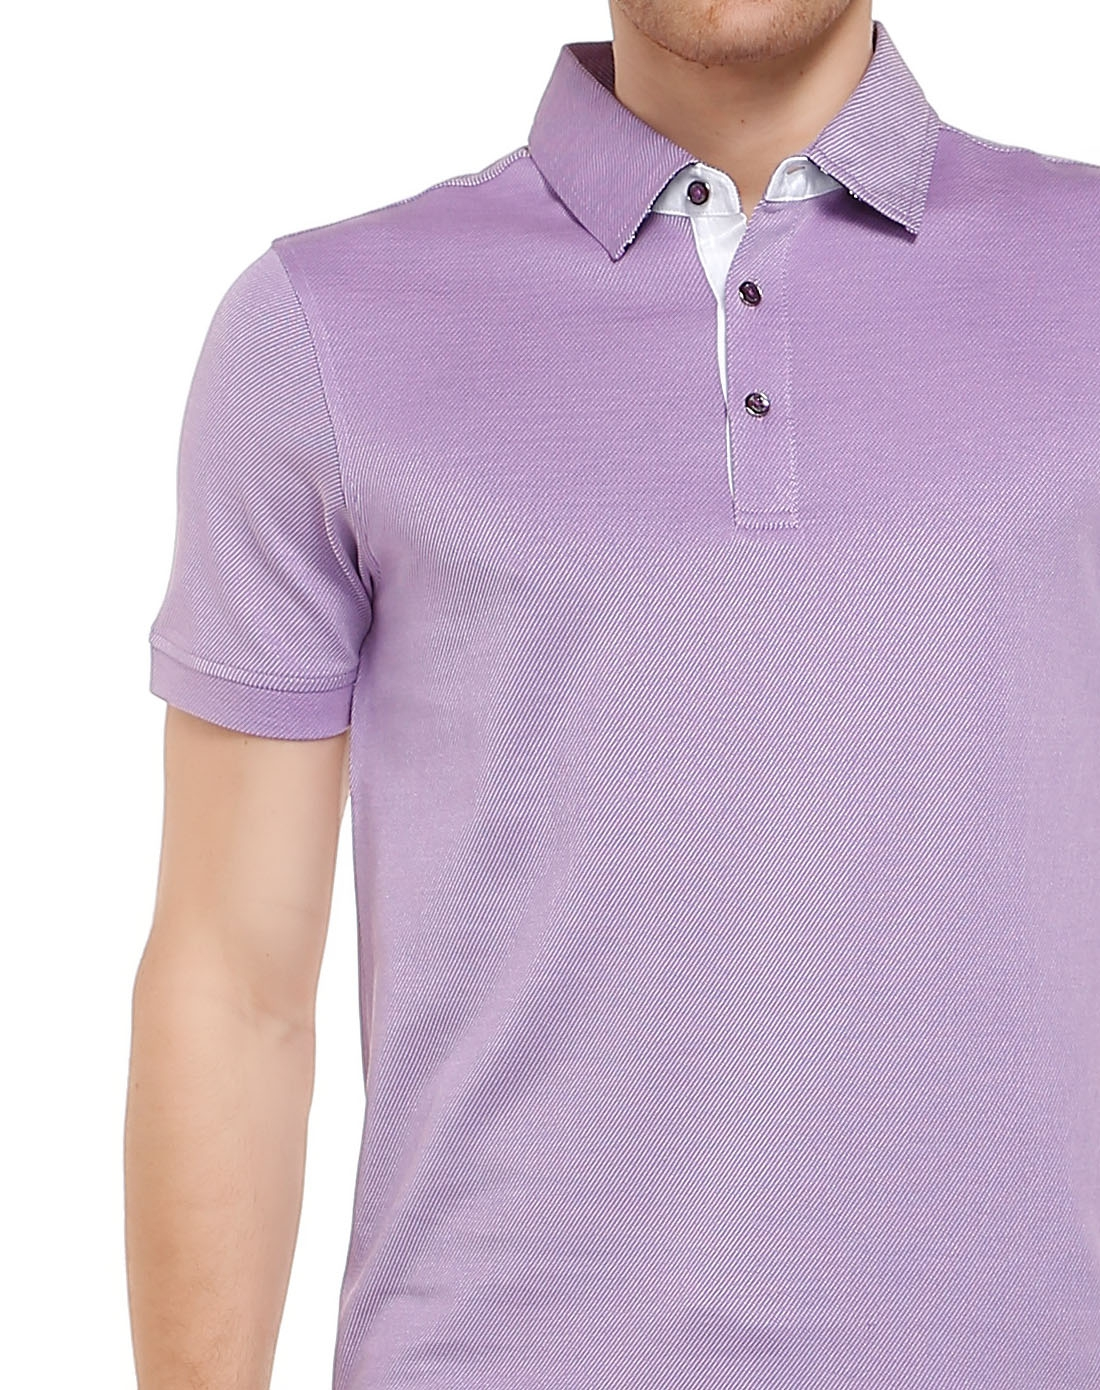 solosali 休闲斜线纹紫色短袖t恤